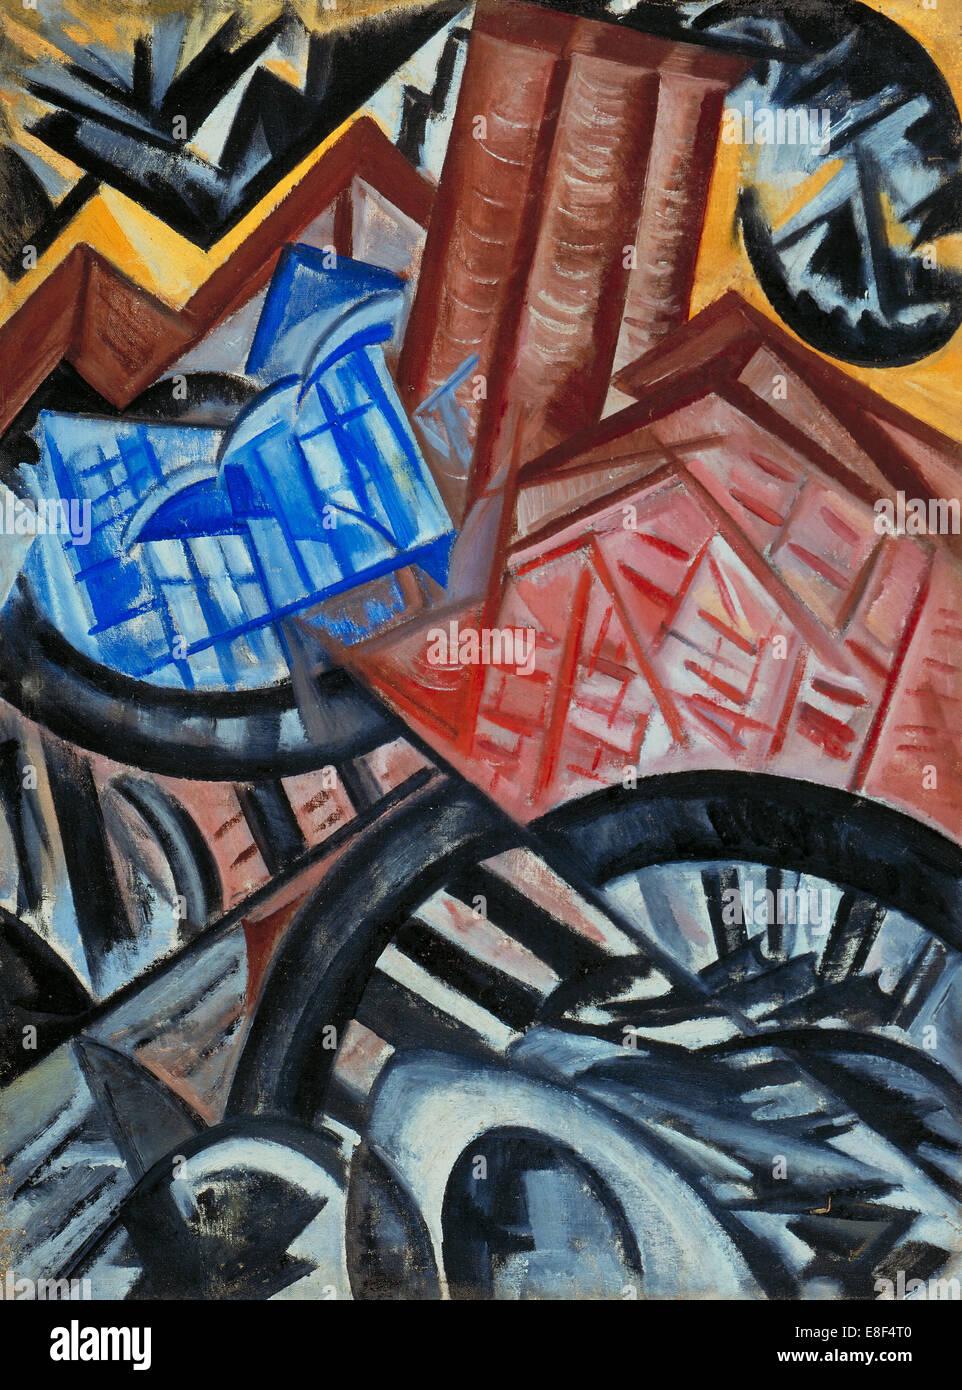 Factory and the Bridge. Artist: Rozanova, Olga Vladimirovna (1886-1918) - Stock Image